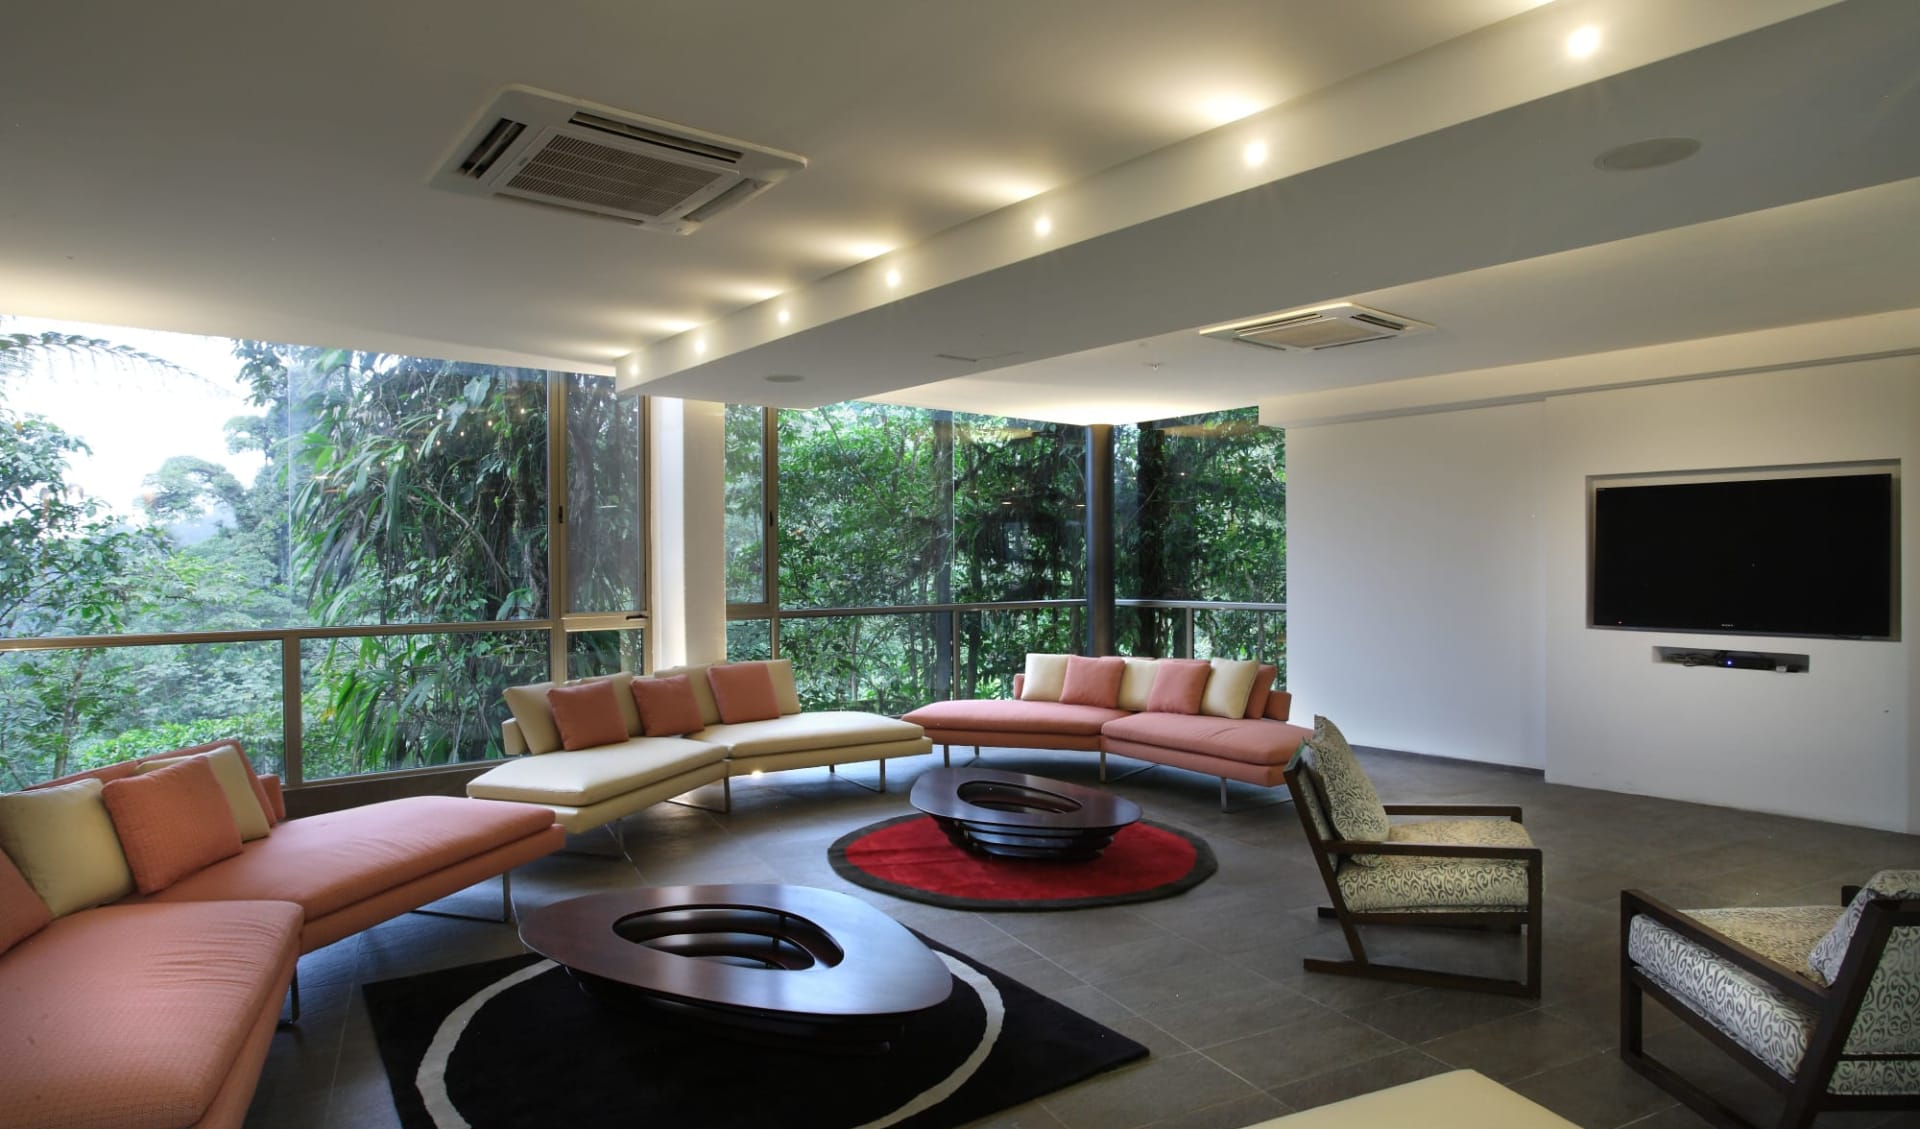 Mashpi Lodge ab Quito: facilities: Mashpi Lodge - Aufenthaltsraum